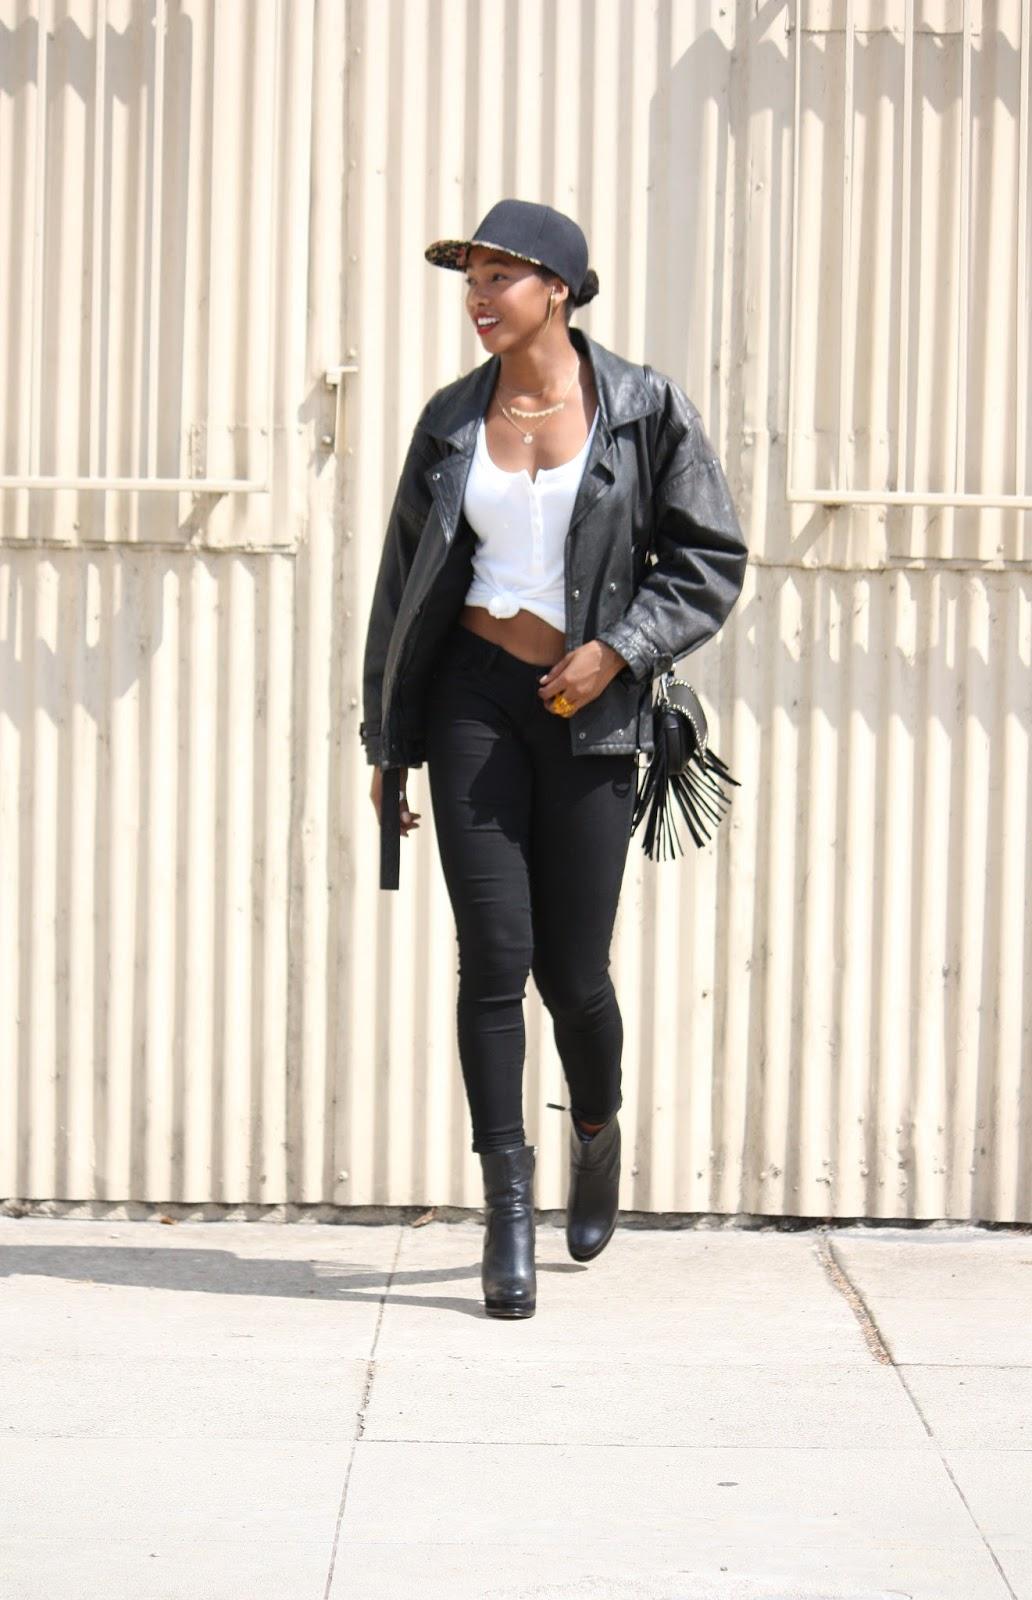 Wearing //  Generic snapback, Jami earrings, Mr Kate Beautymarks, H&M ribbed tank, vintage leather jacket, Old Navy Rockstar jeans, Nine West Boots